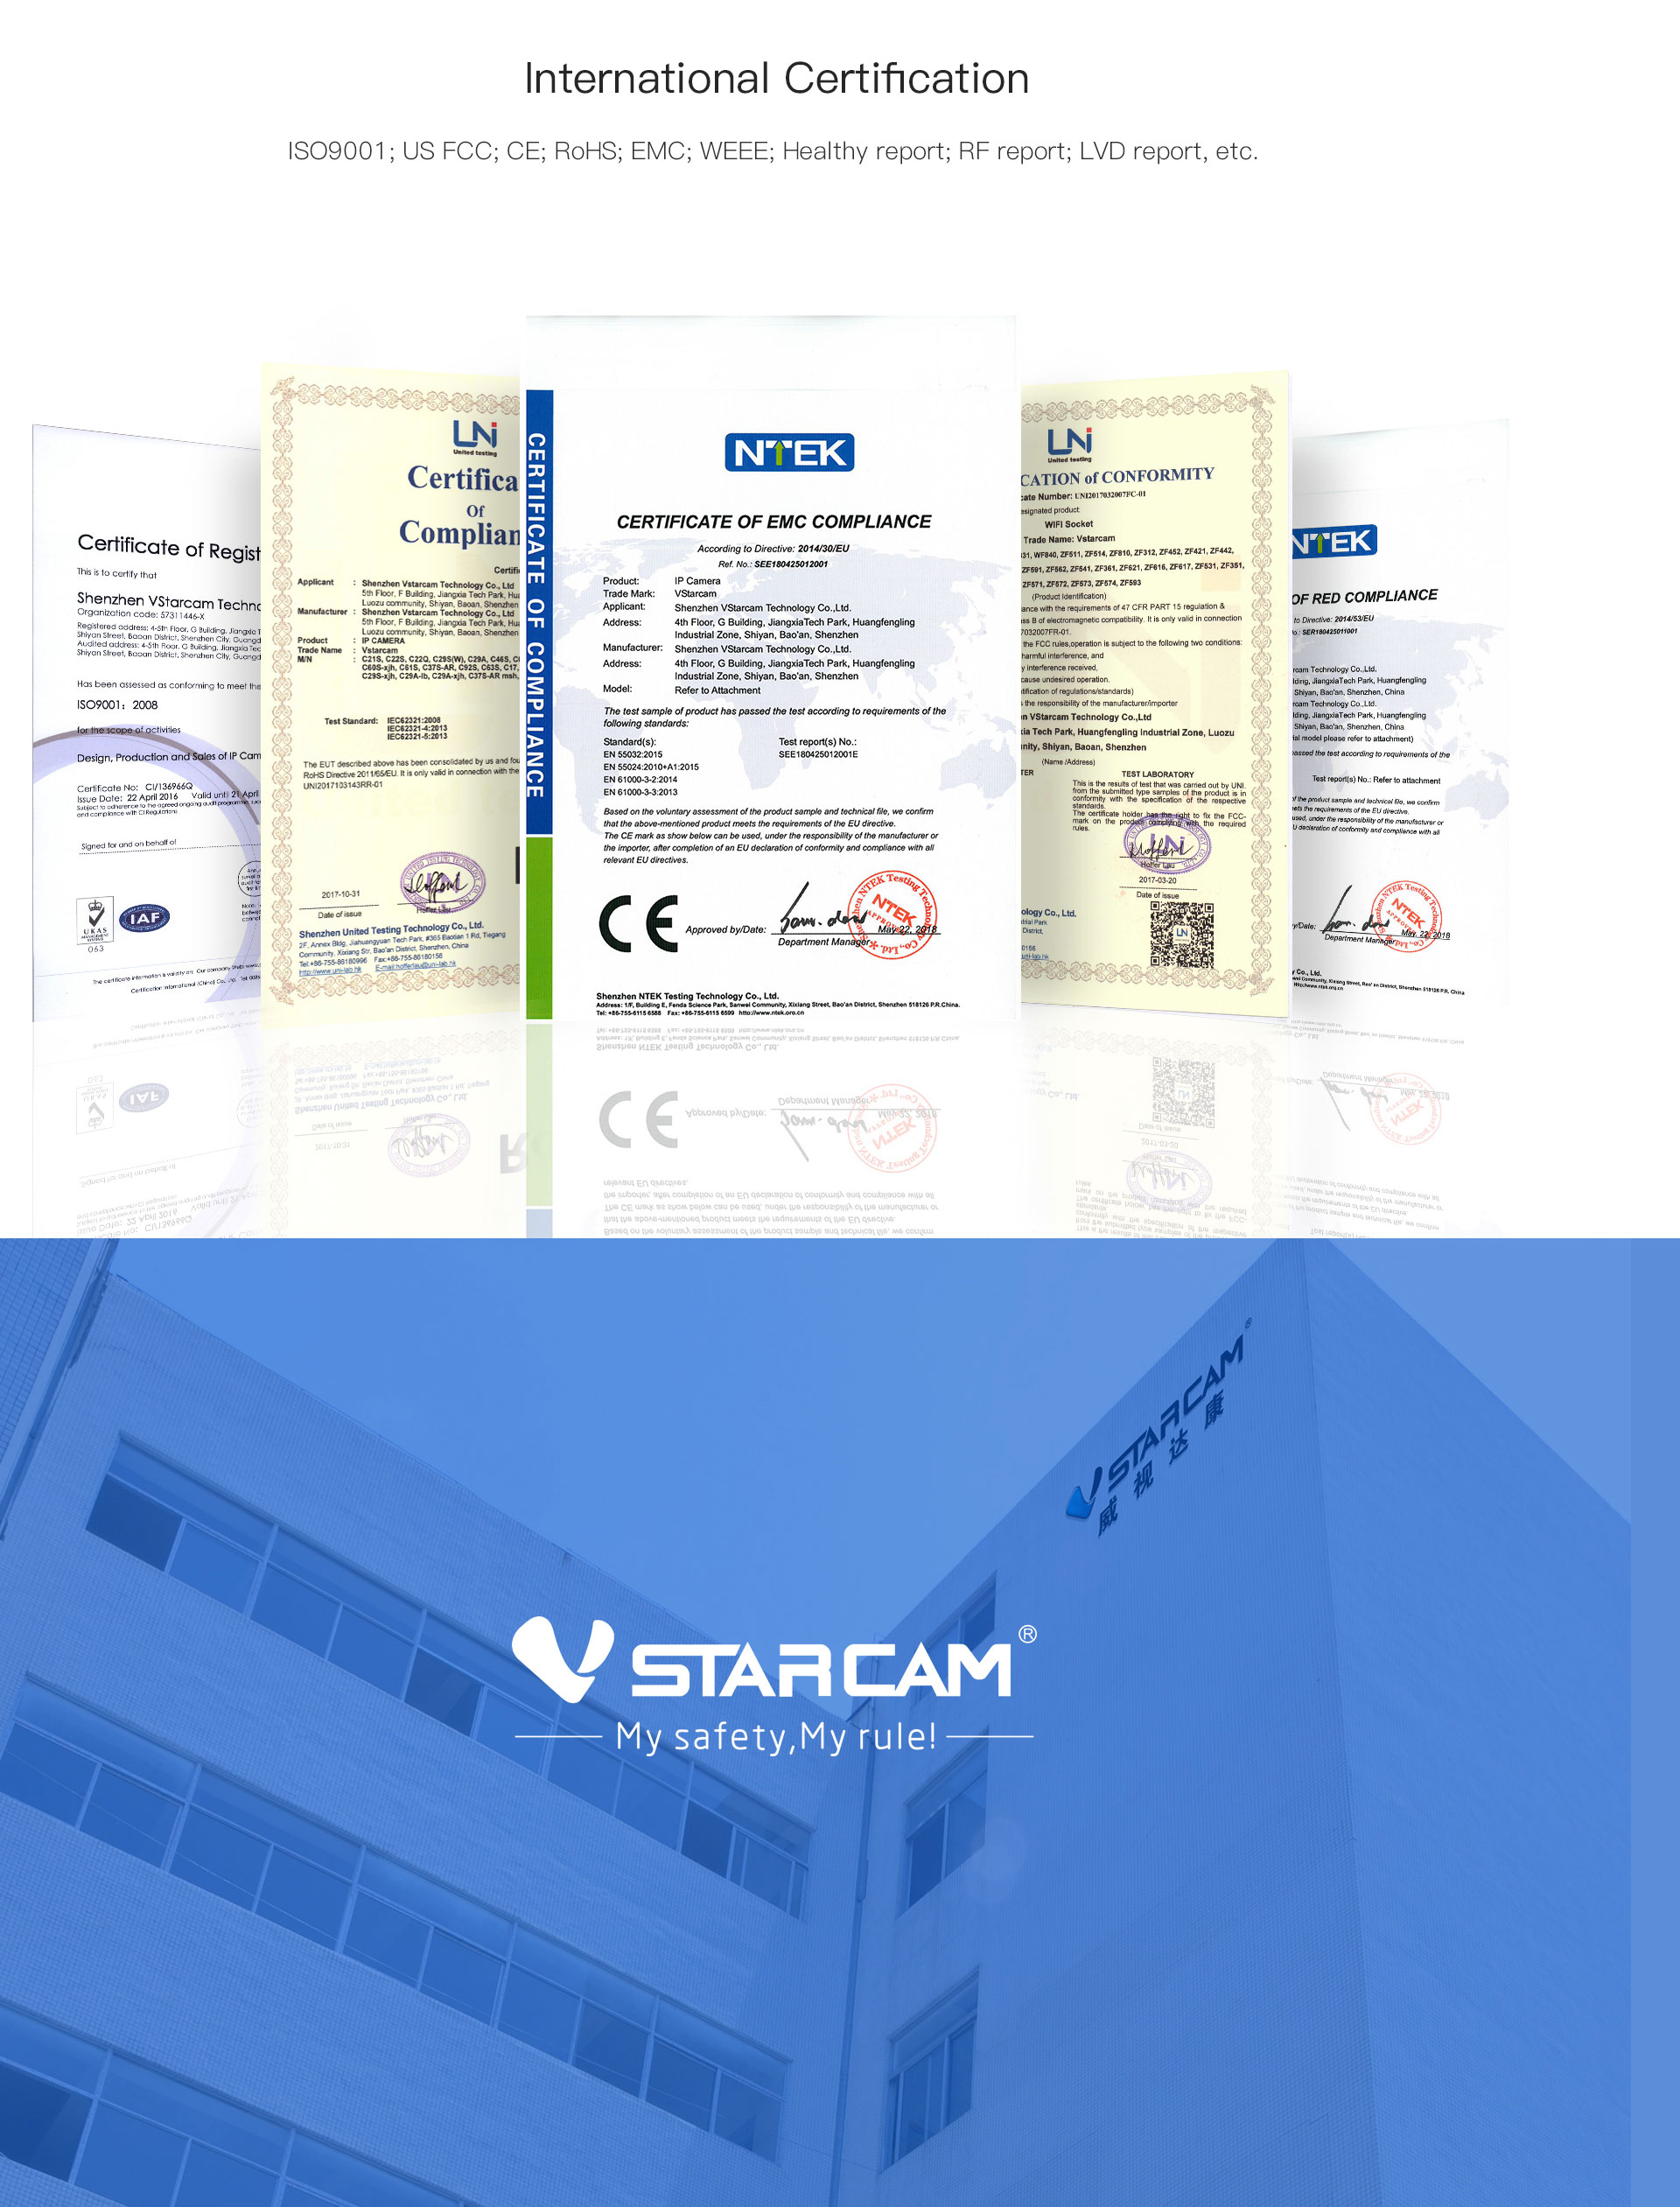 VStarcam